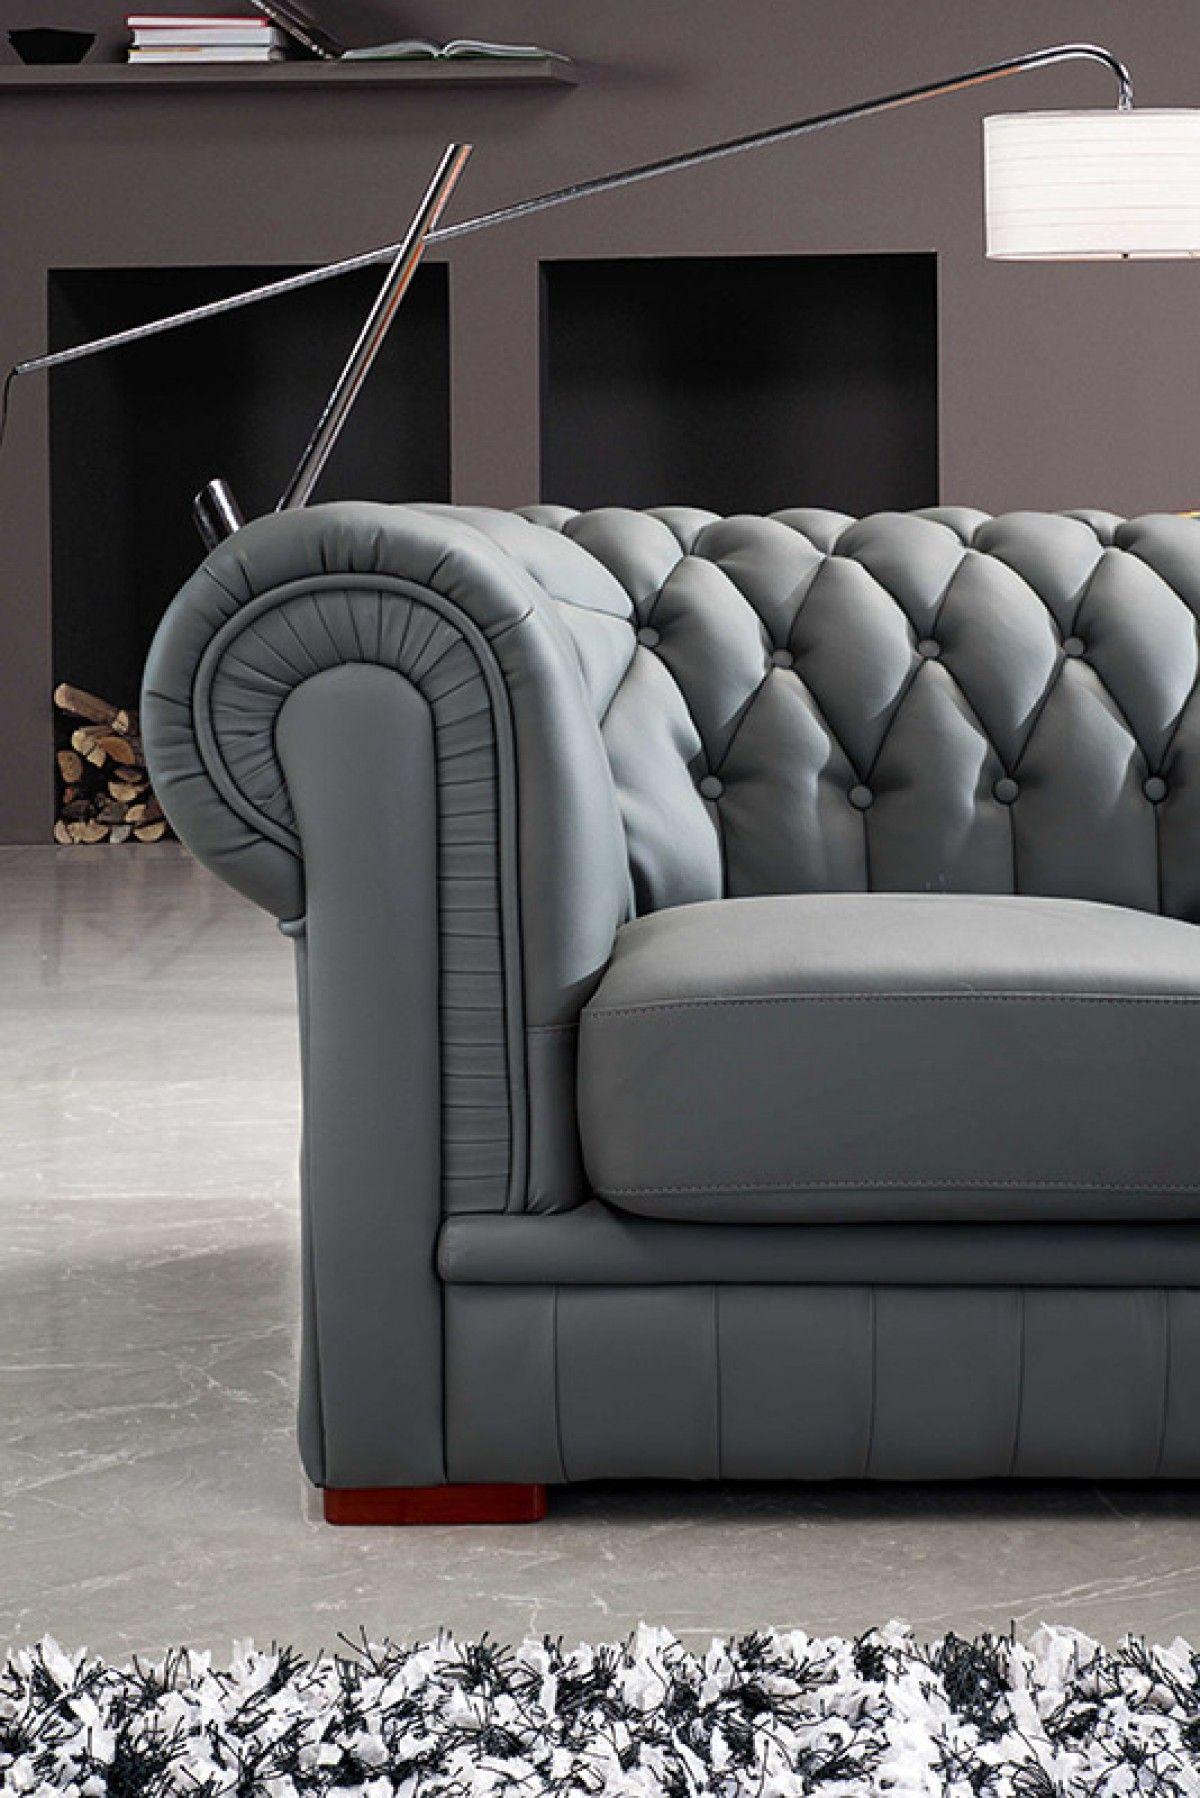 Braun Schnitt Couch 3 Teilige Couchgarnitur Grau Weissem Leder Sectional Sektionaltore Leder Sectional Sofa Getuftete Sof Ecksofas Getuftet Modernes Ledersofa